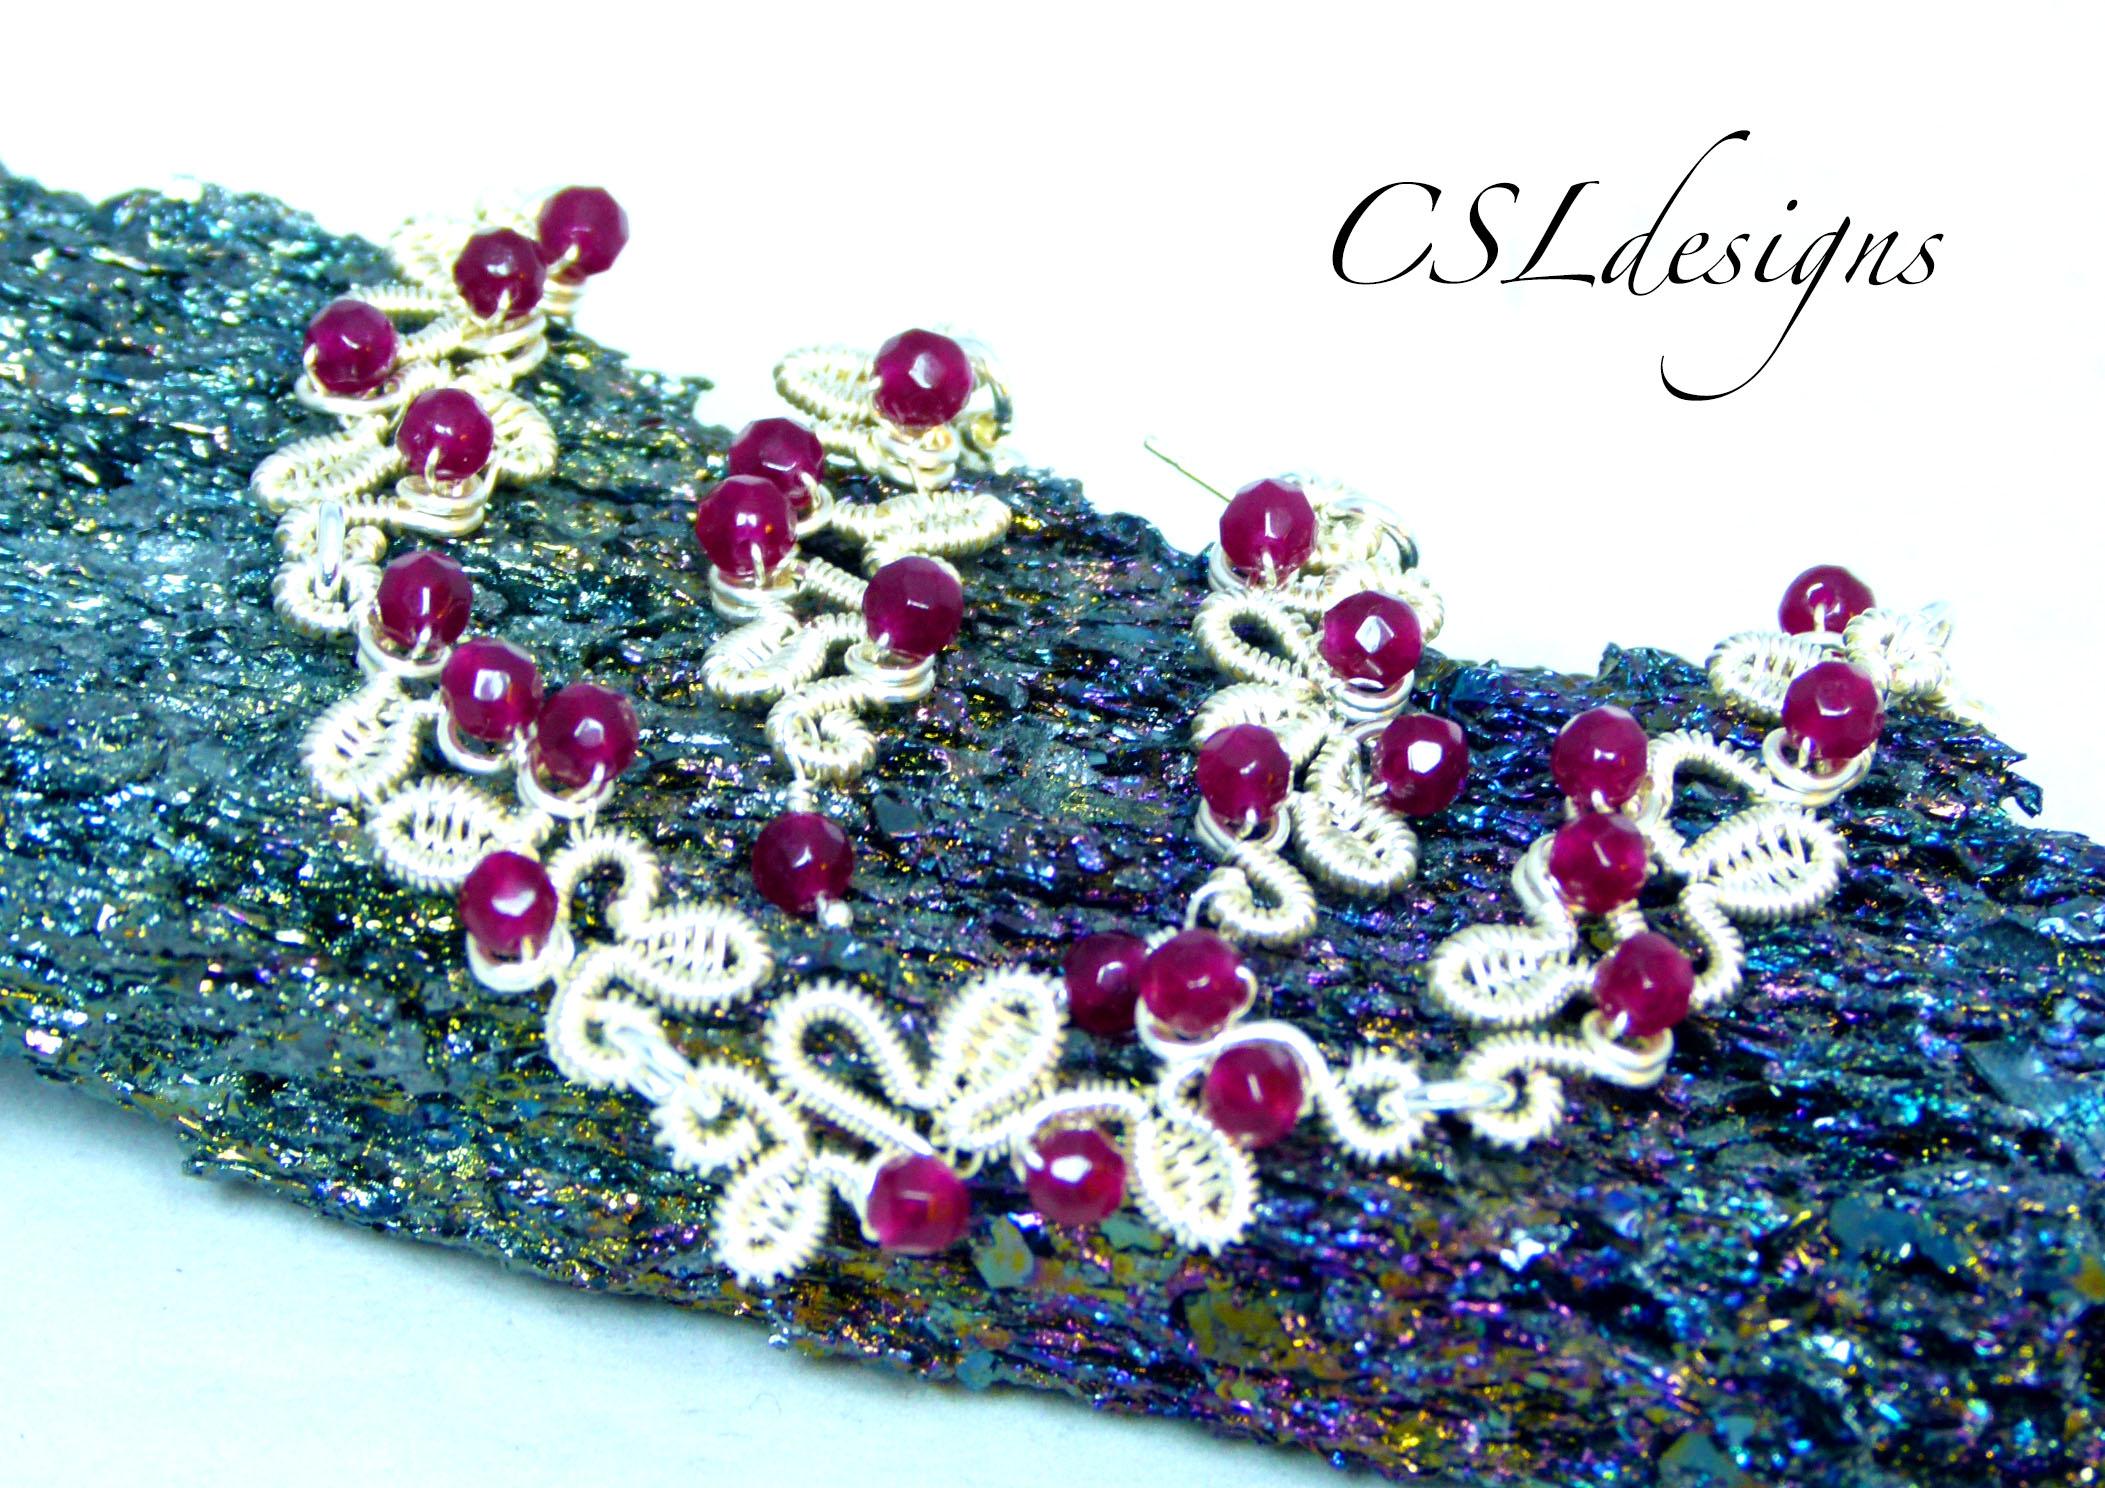 Embellished organic wirework chain thumbnail.jpg